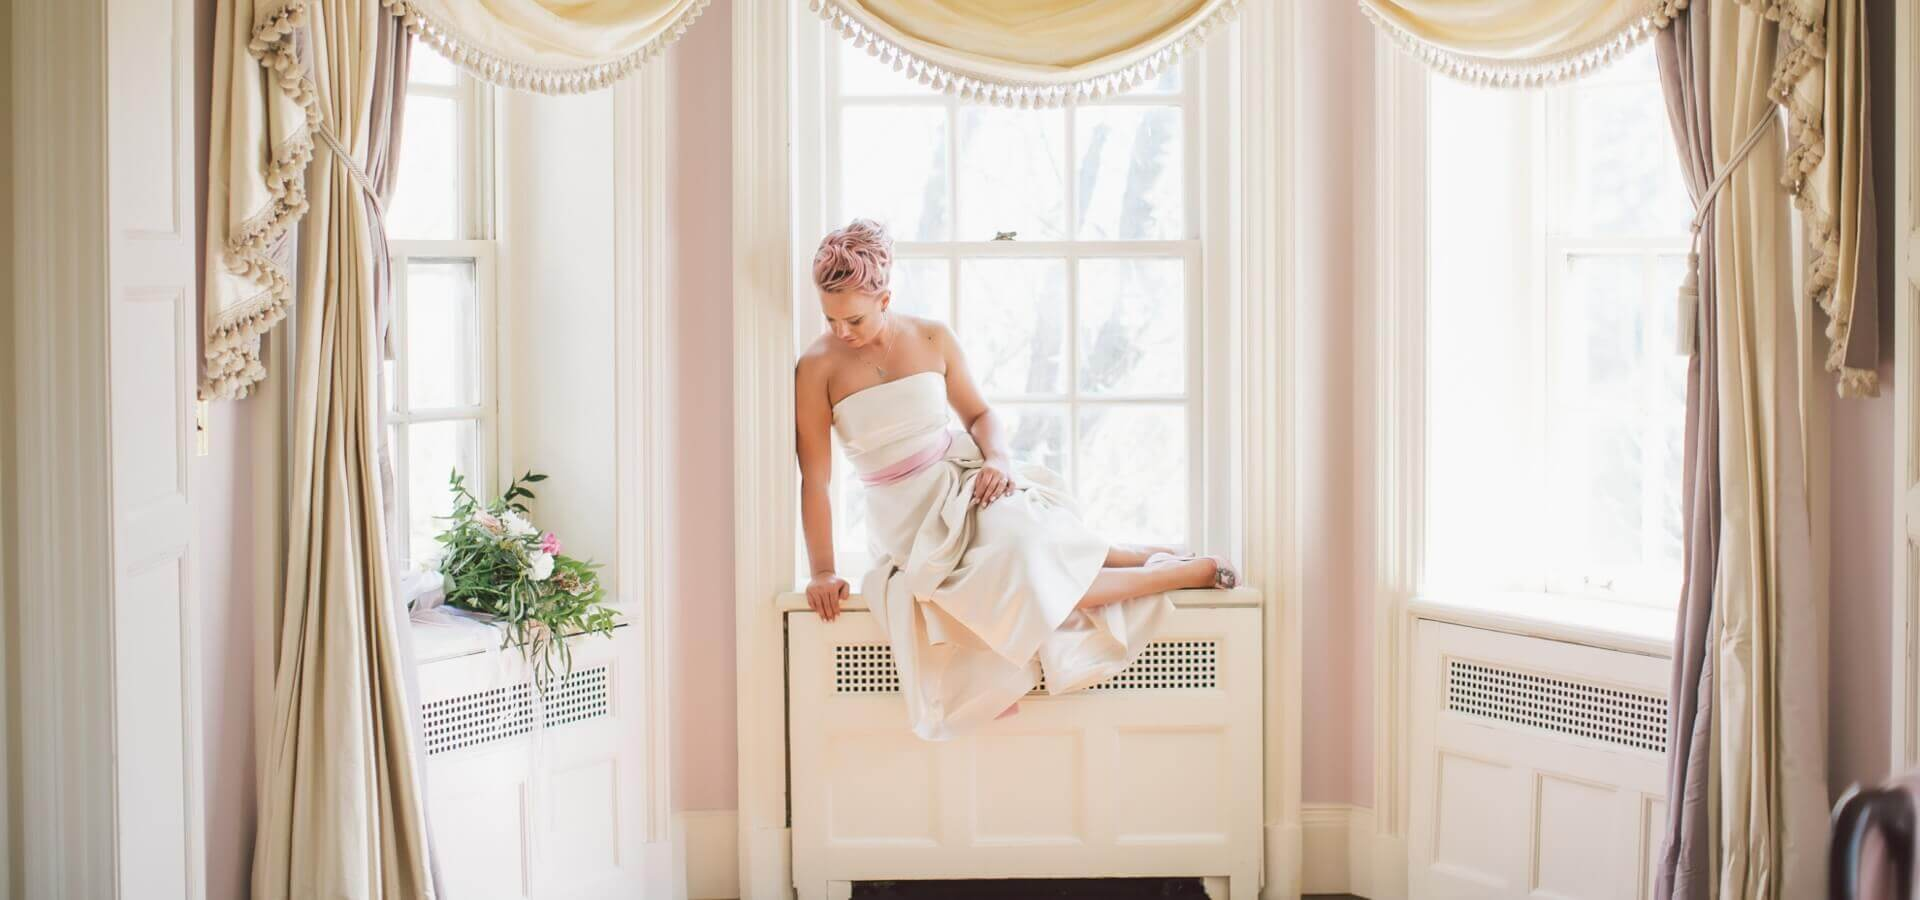 Hero image for Yana and Abid's Elegant Wedding at Graydon Hall Manor